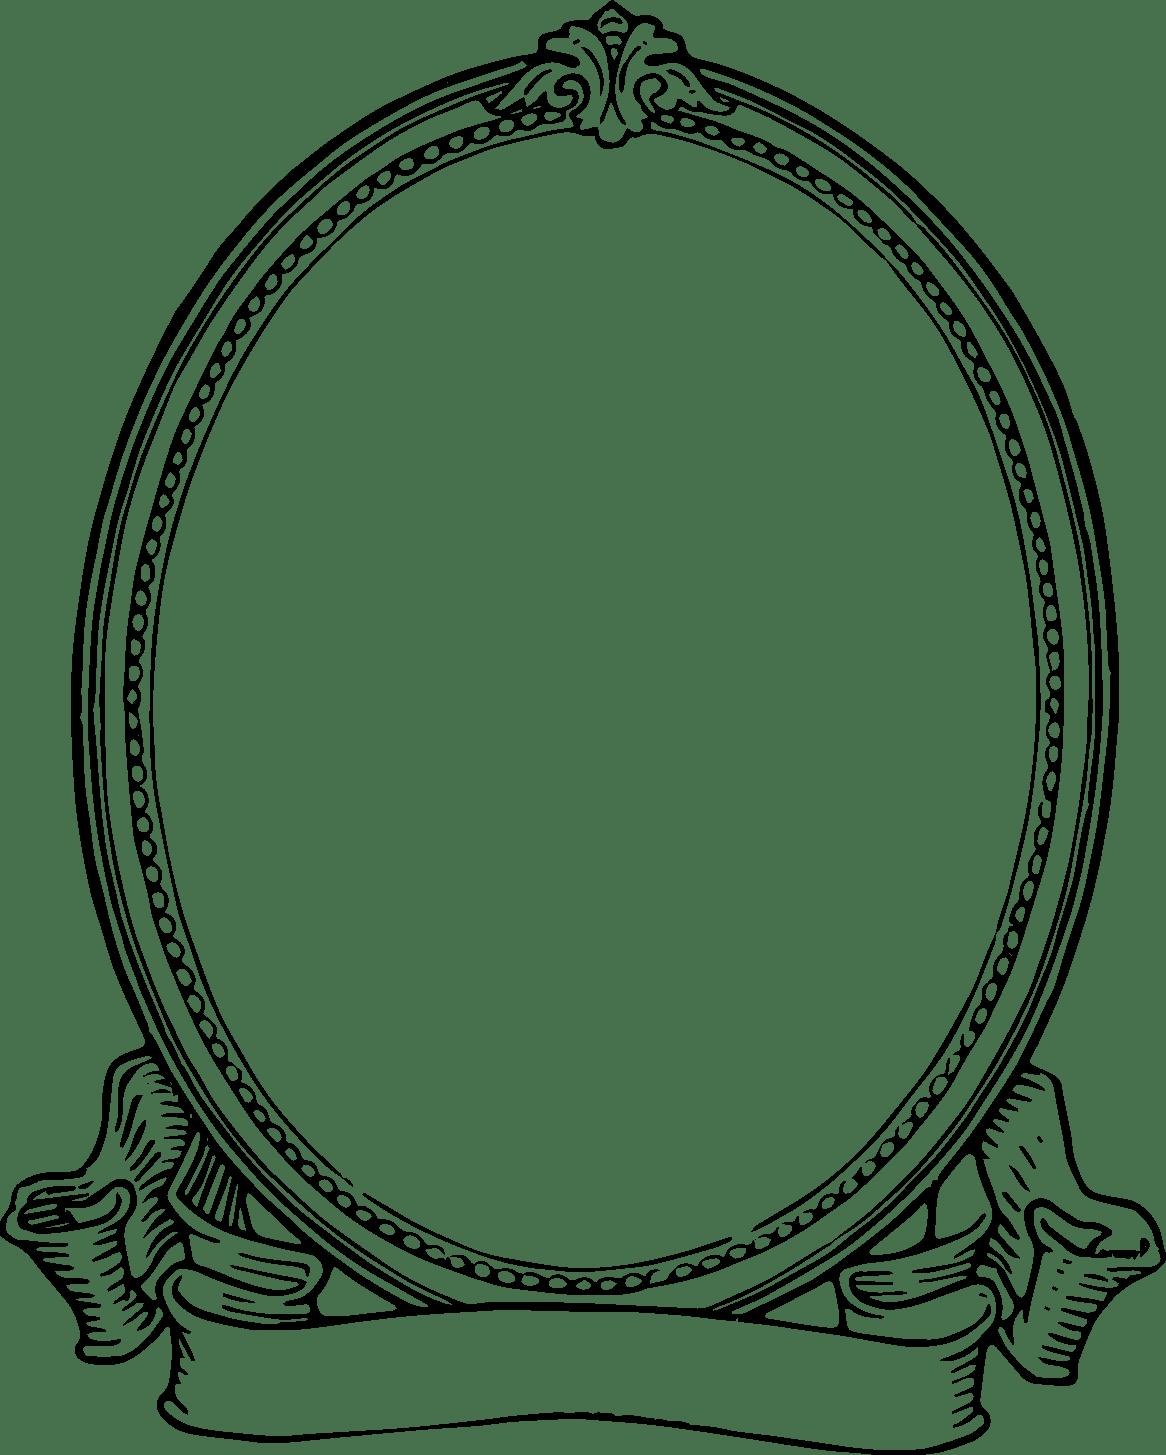 20 Simple Vintage Frame Border Clip Art Ideas And Designs